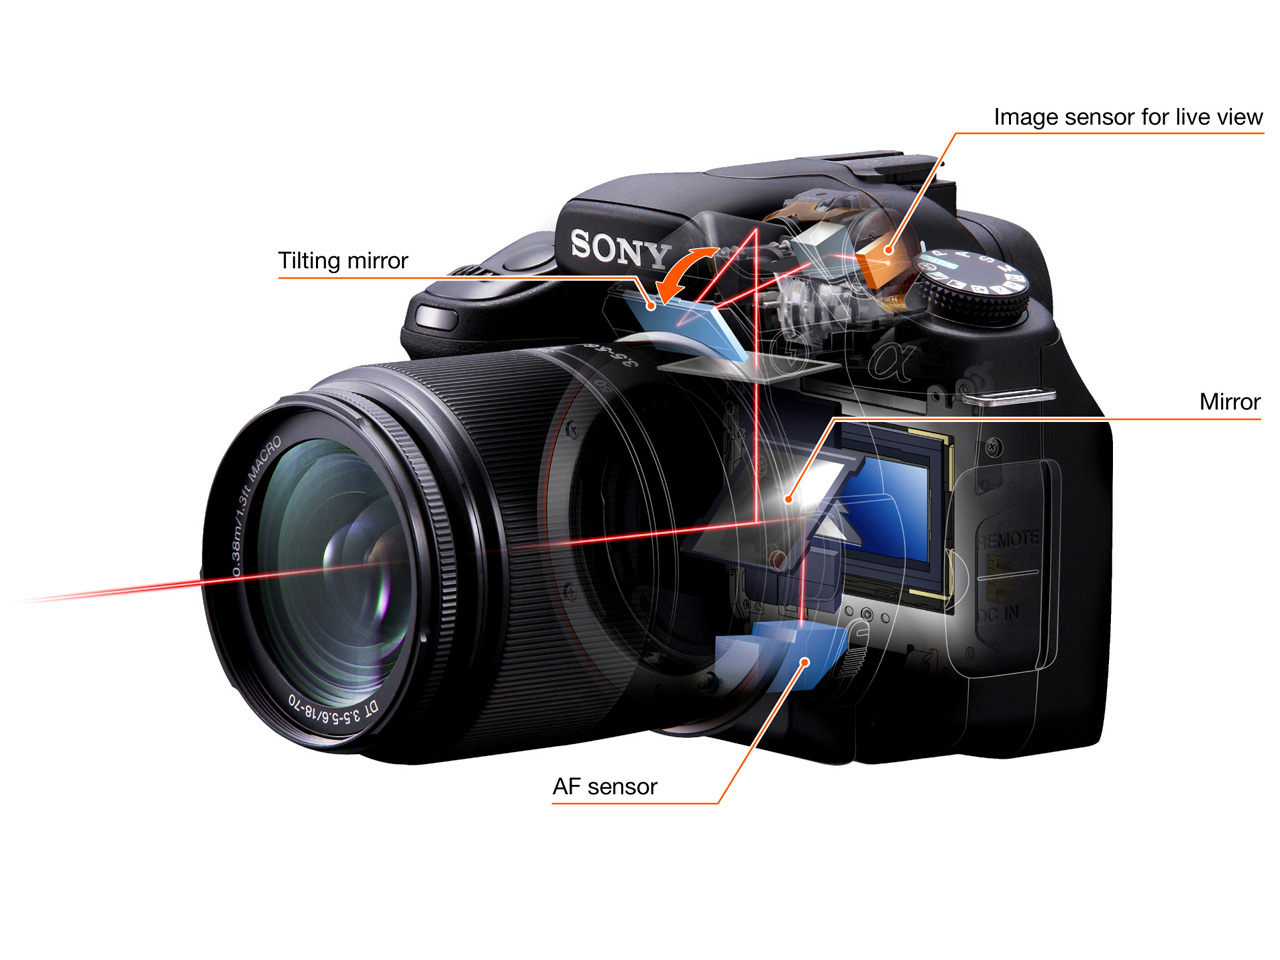 sony alpha dslr a350 review digital photography review rh dpreview com sony alpha a350 manual pdf sony alpha 350 manual español